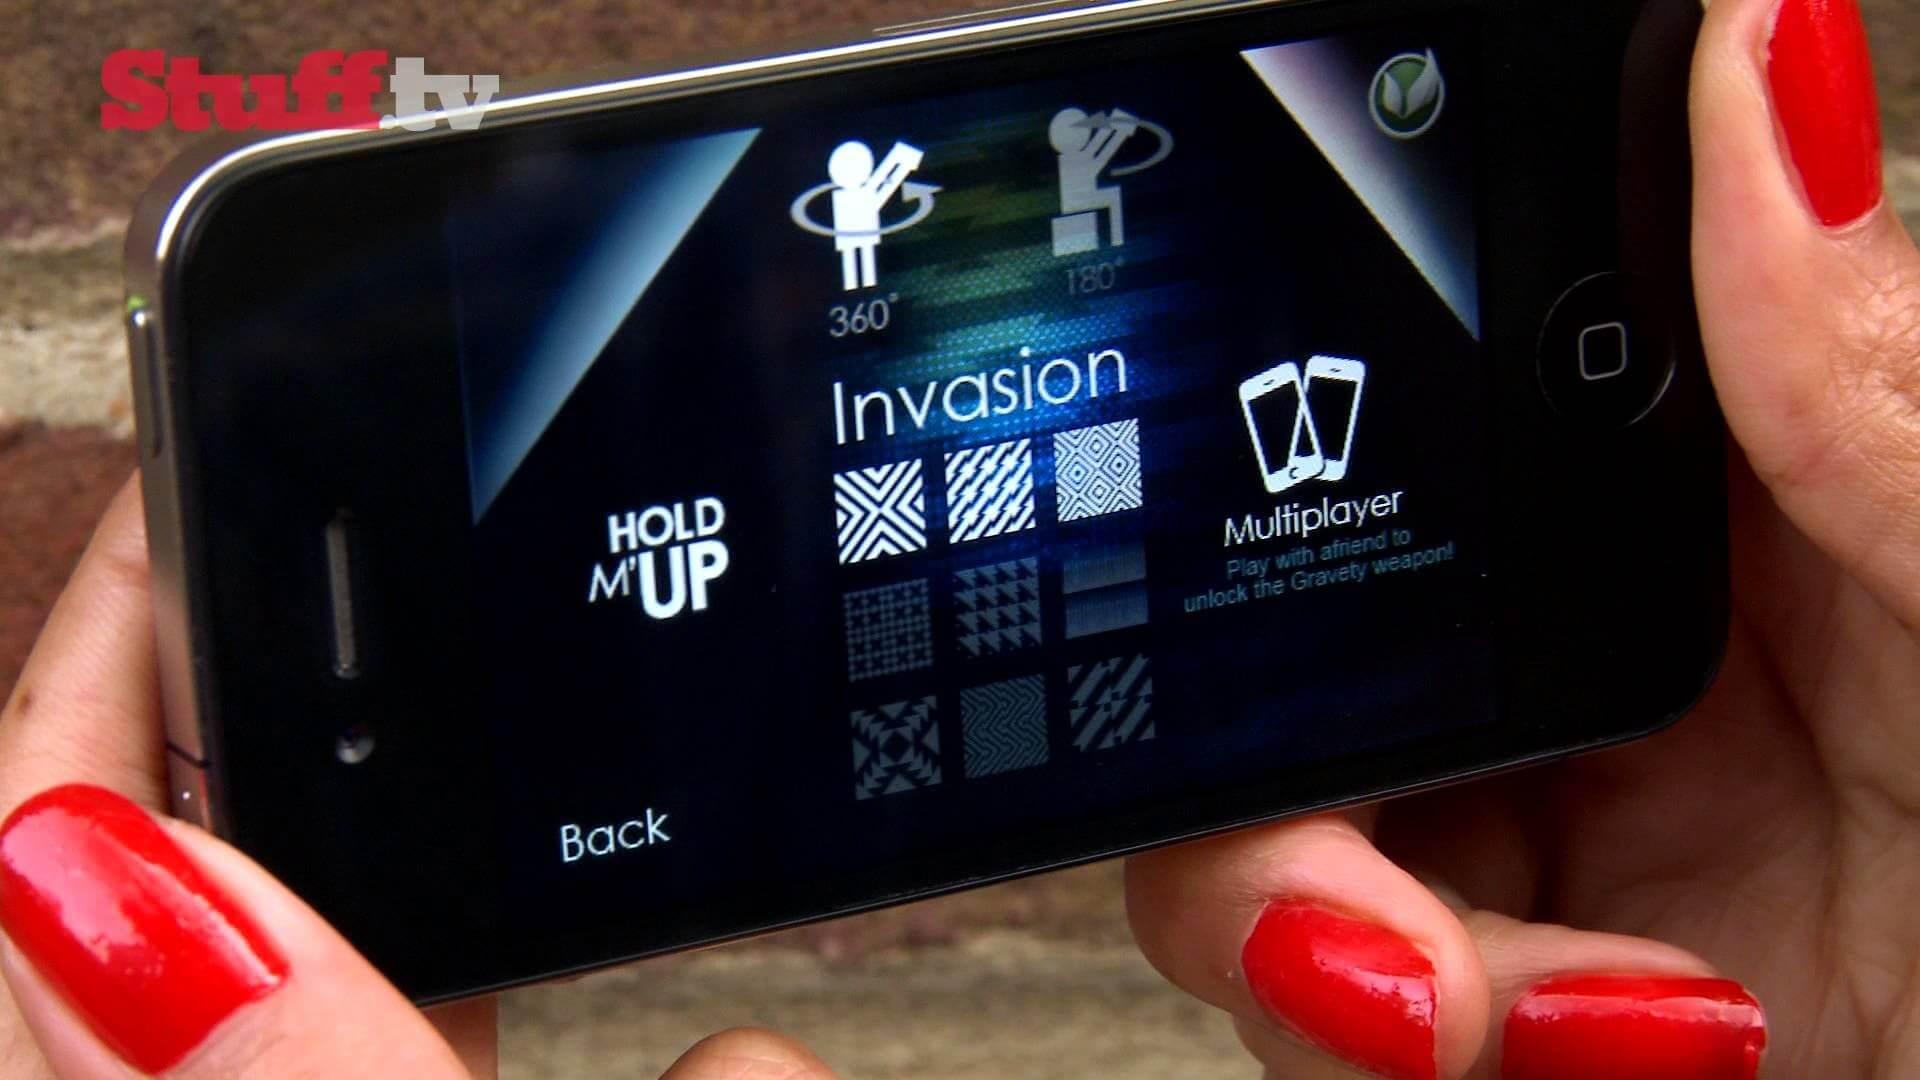 AR Invaders game screenshot